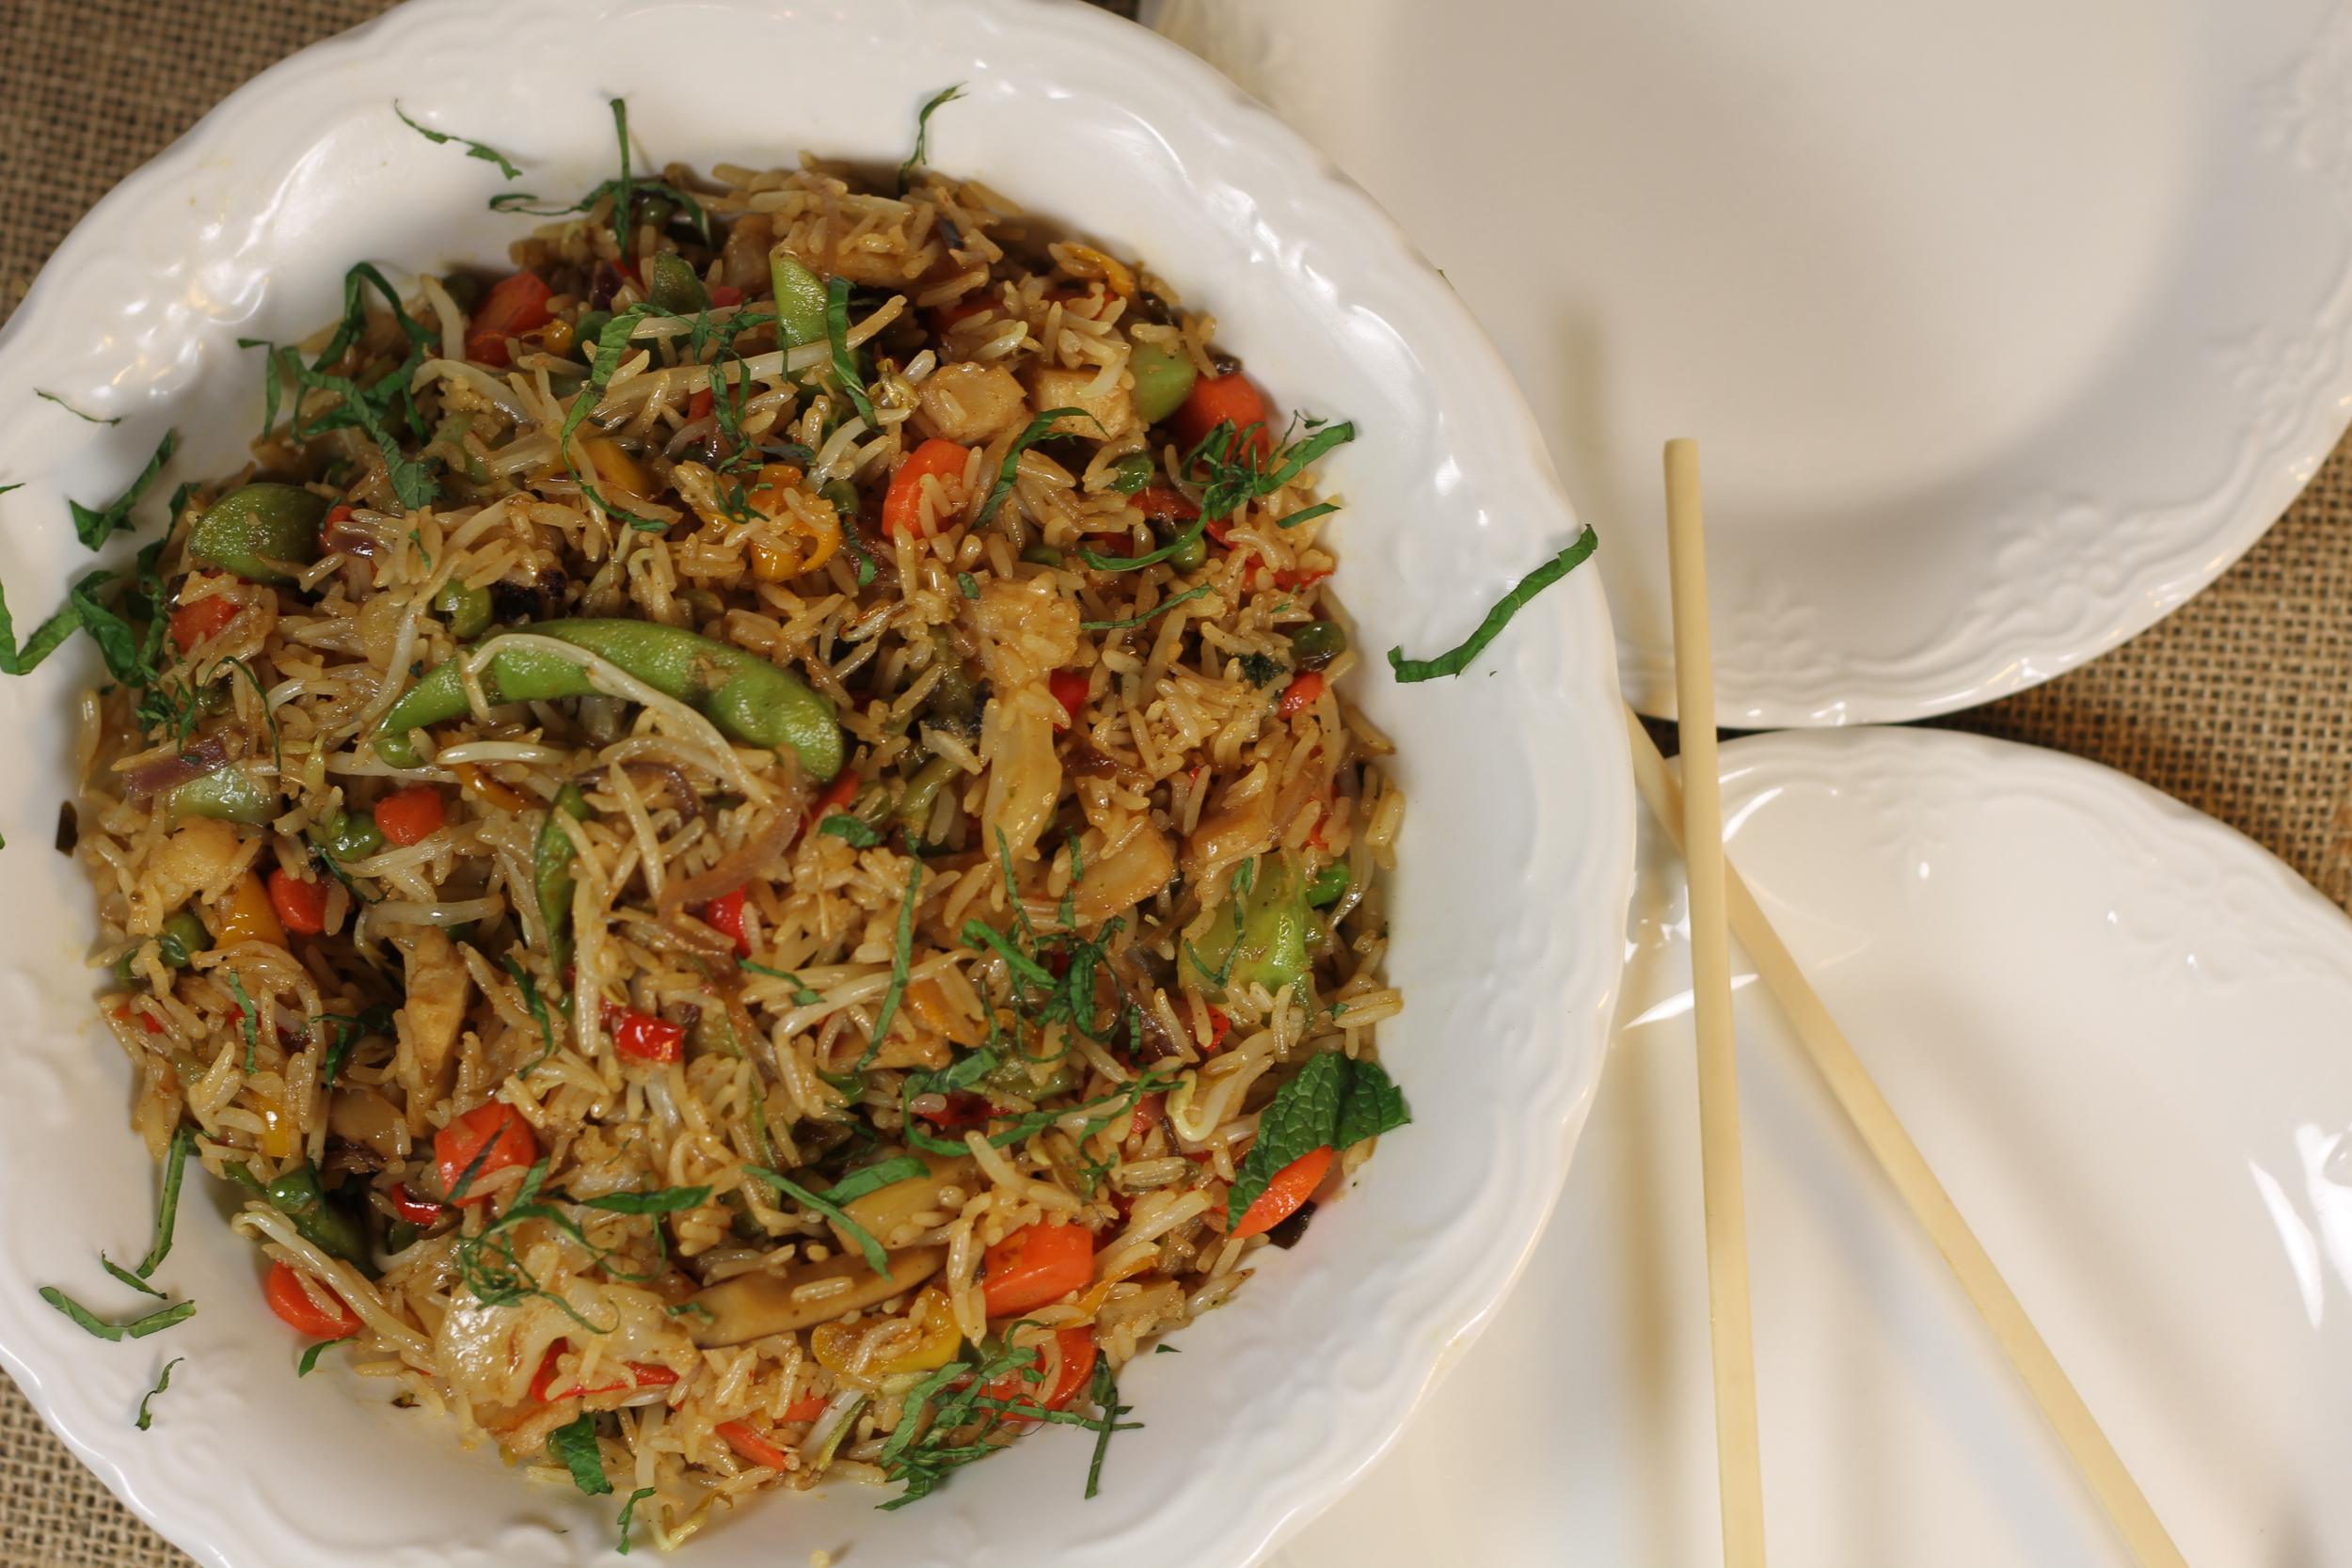 Sriracha Teriyaki Chicken with Vegetables and Rice